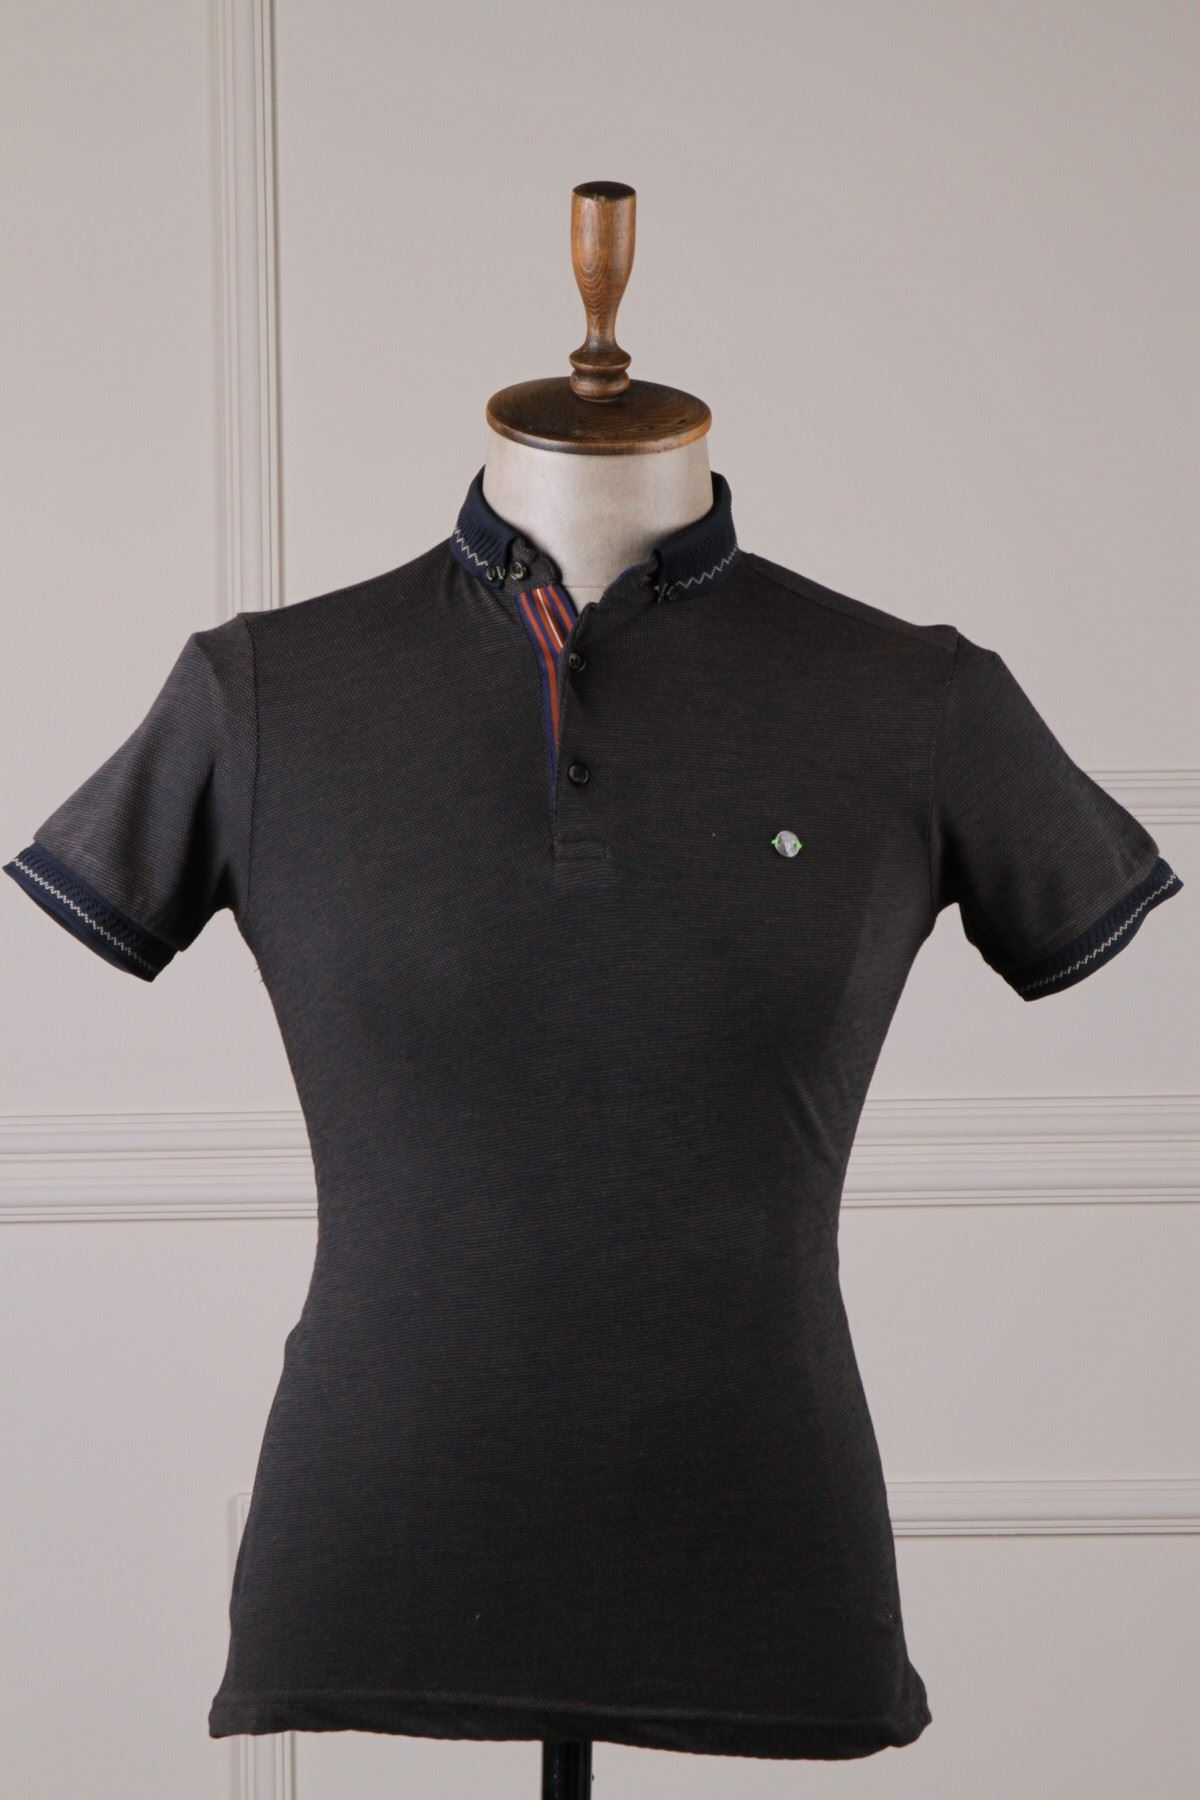 Erkek Nokta Desenli Polo Yaka T-Shirt - Bej